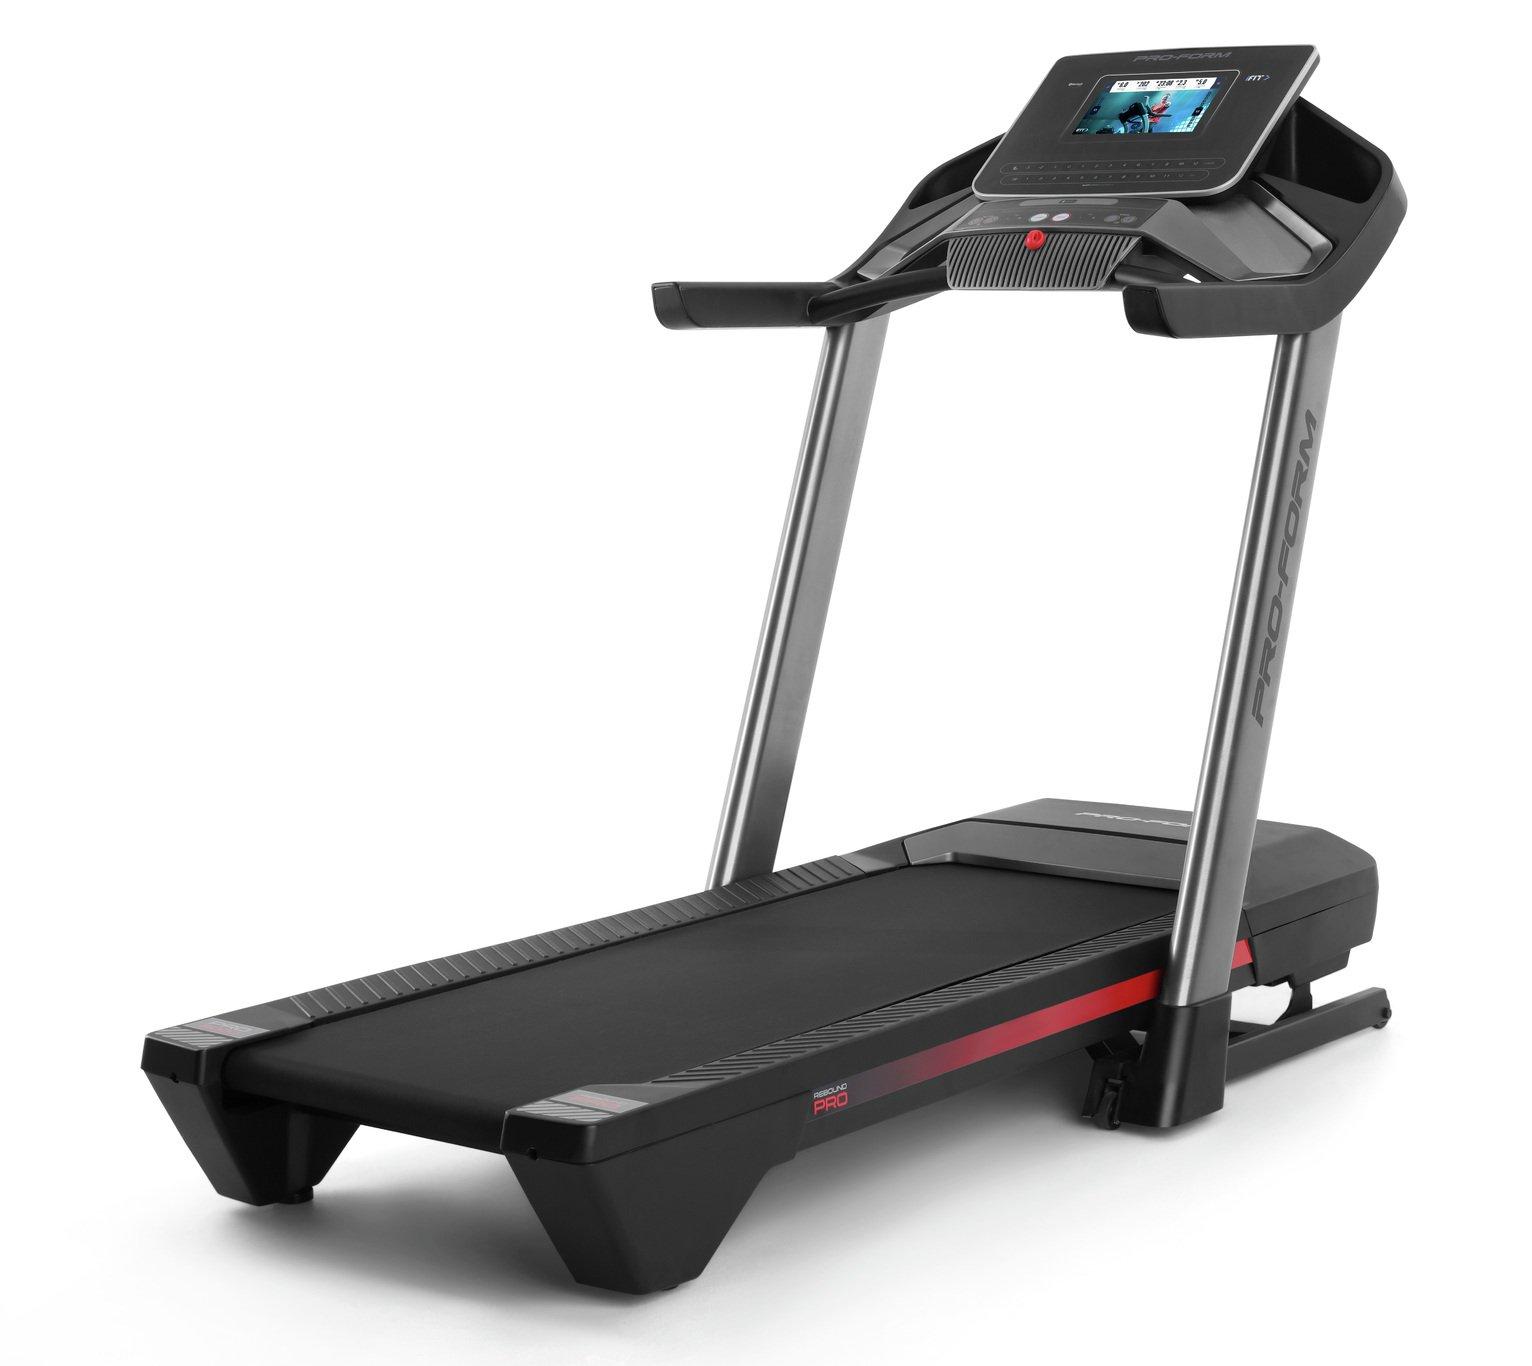 ProForm New Pro 2000 Treadmill